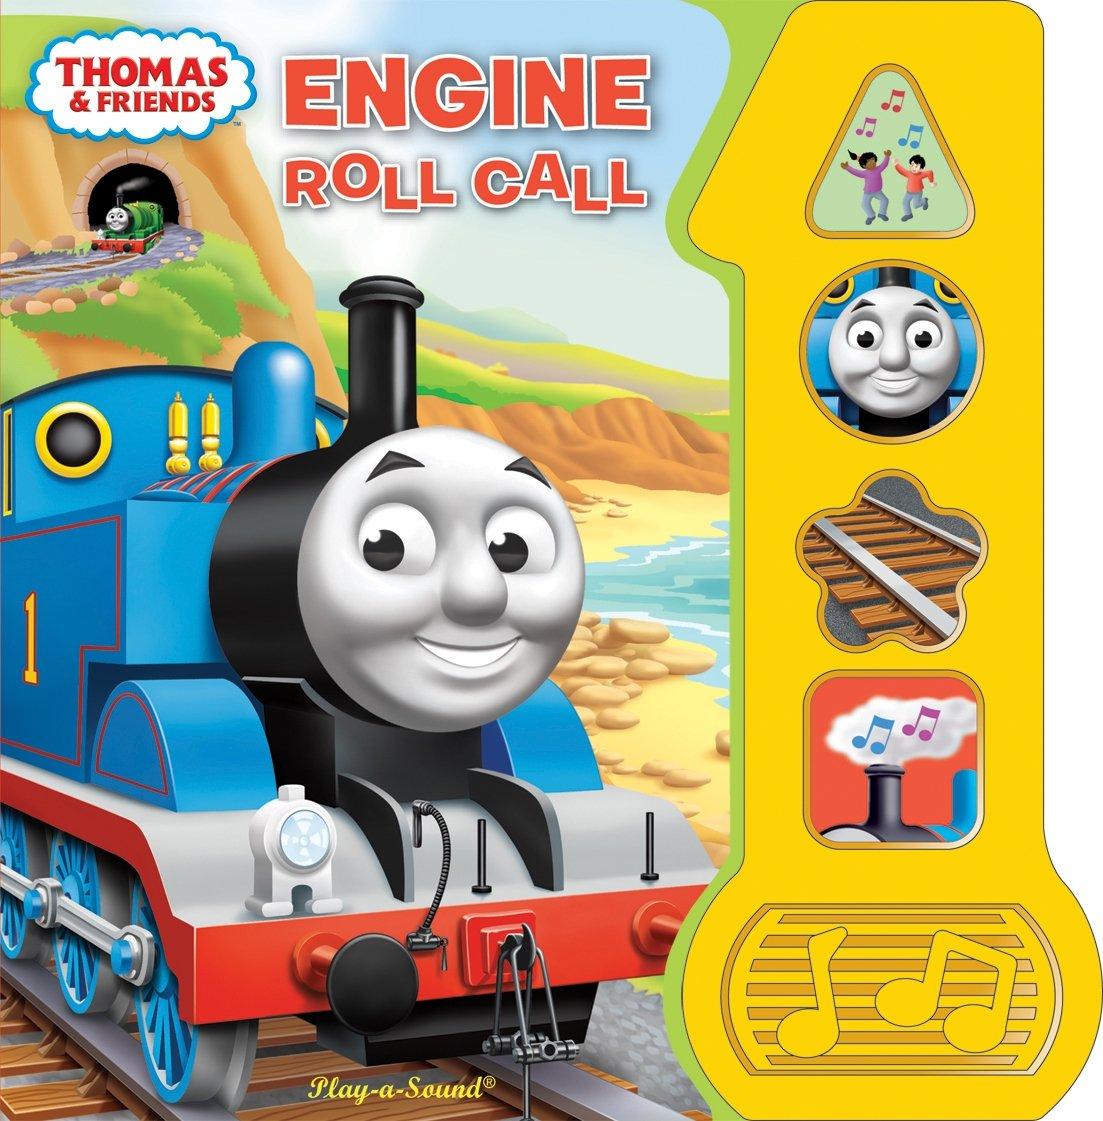 File:EngineRollCall(book).jpg